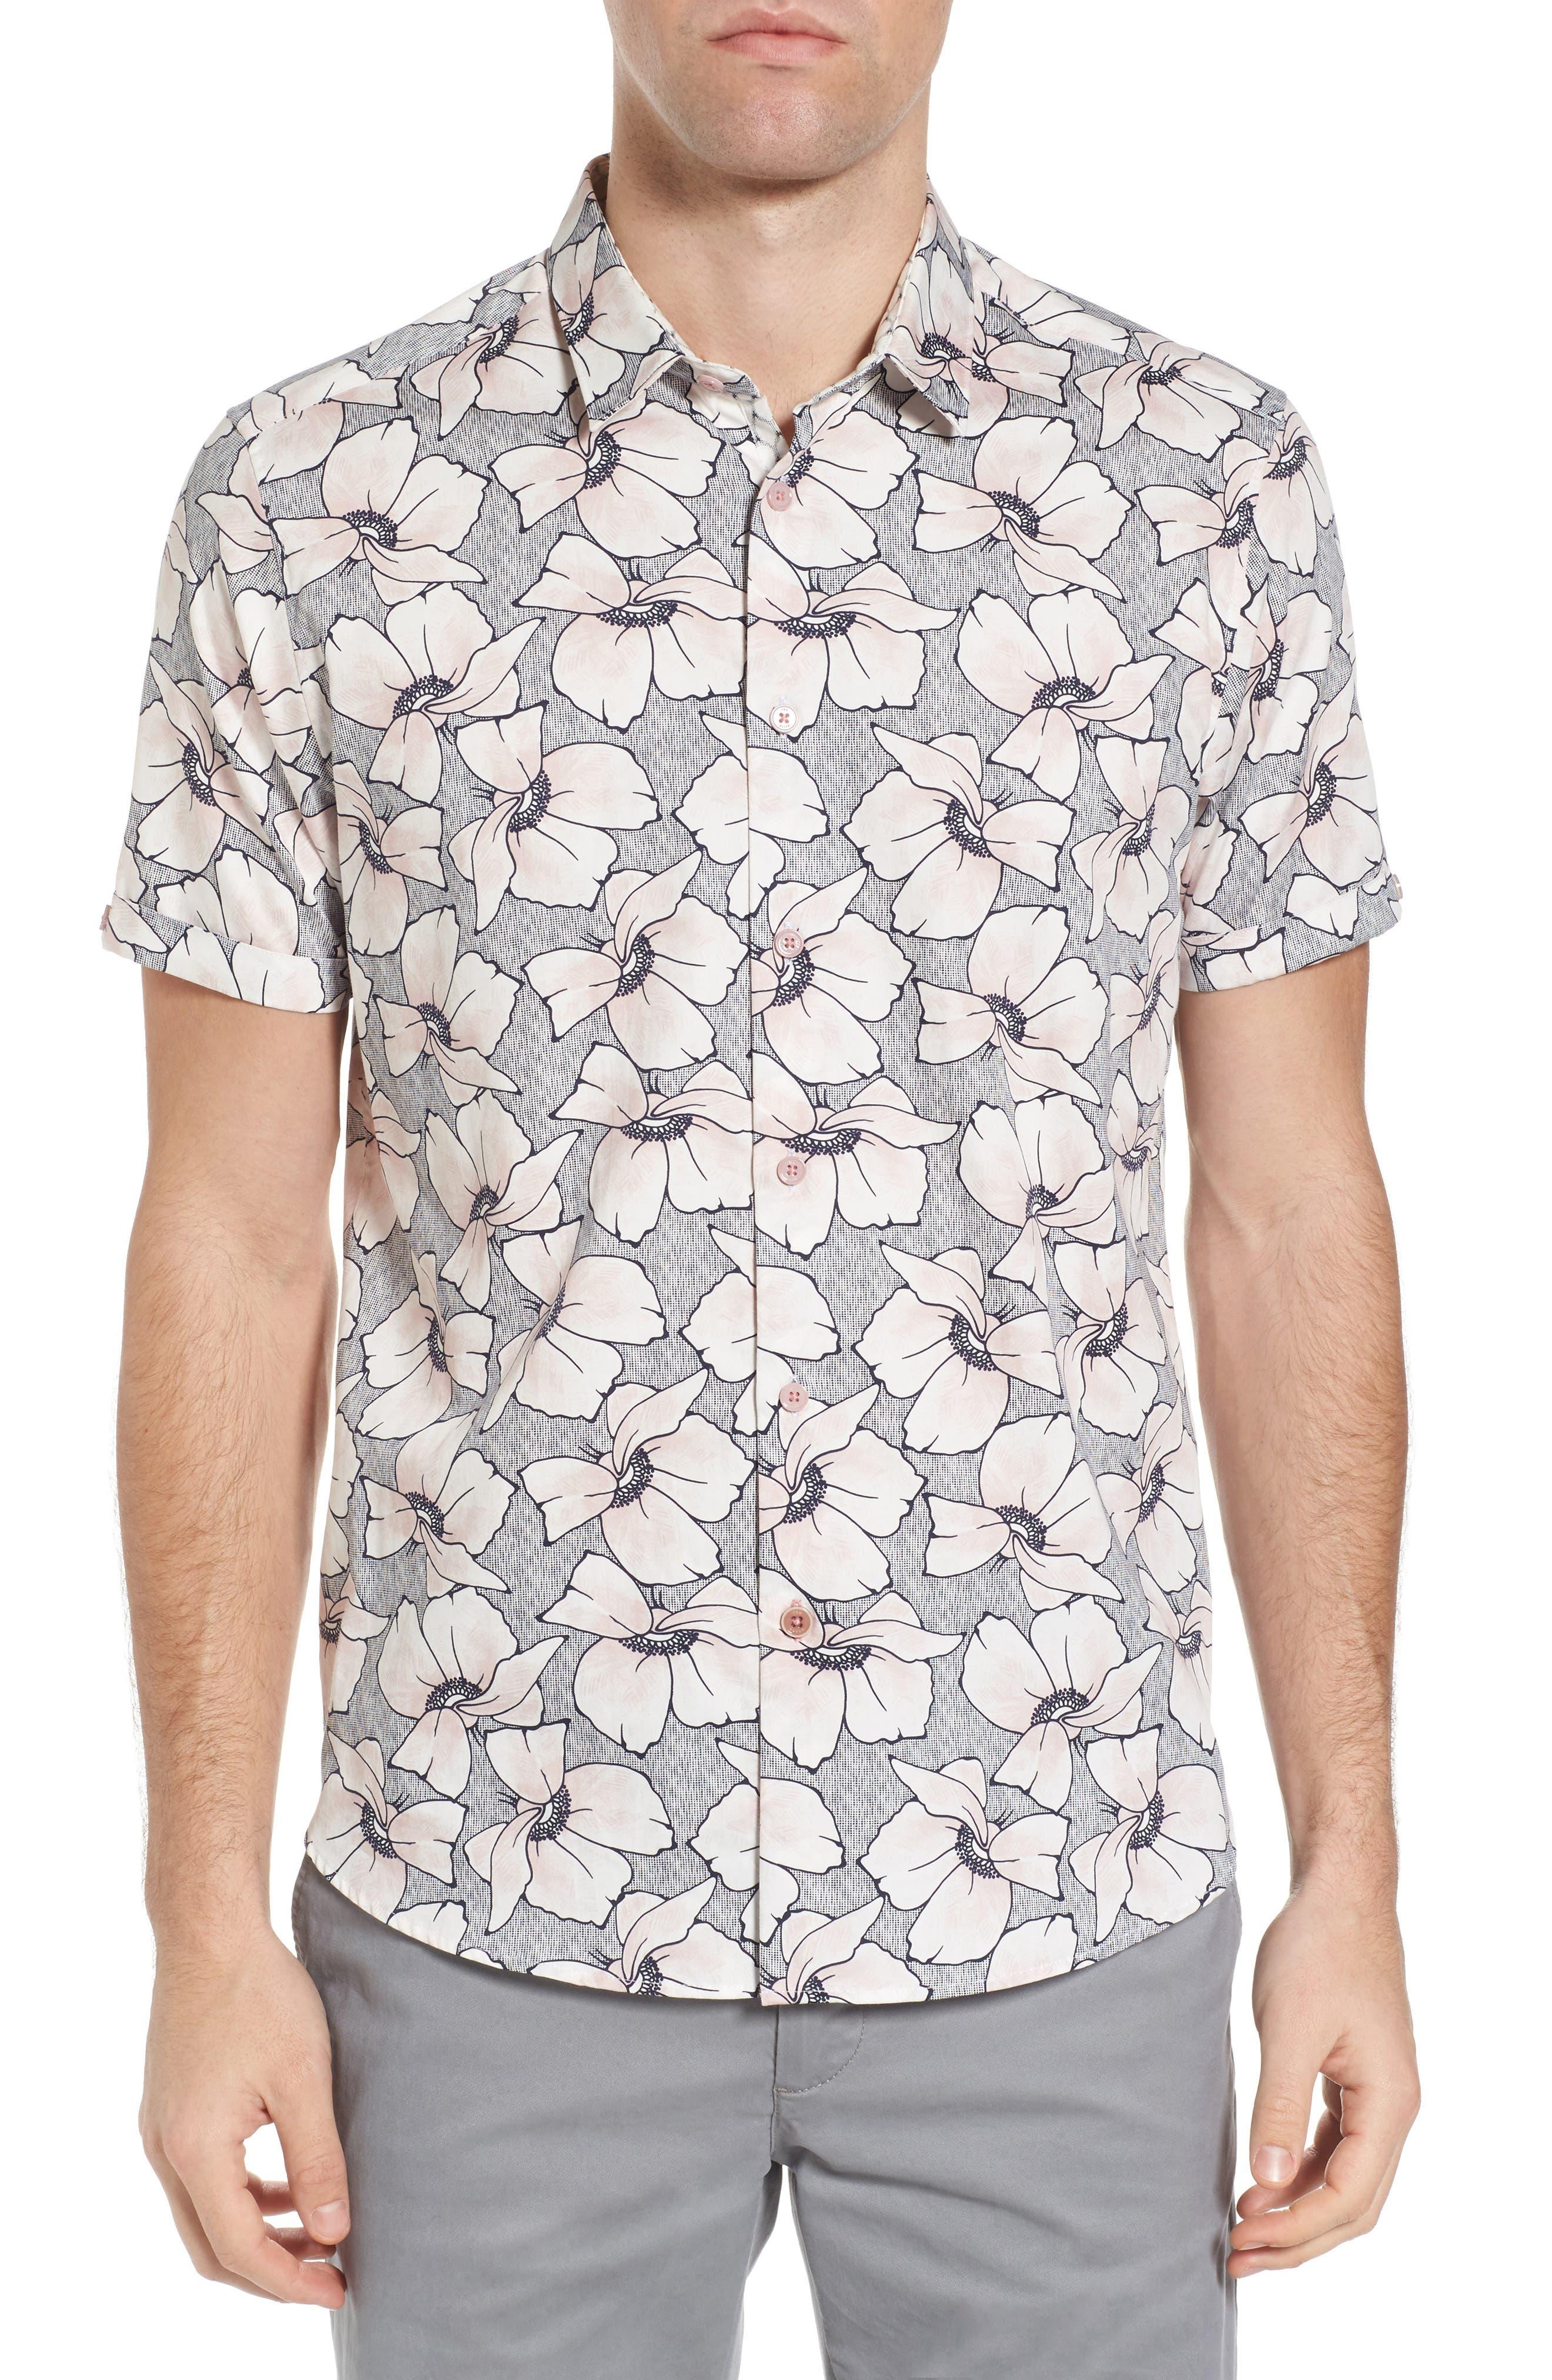 TED BAKER LONDON,                             Bigflo Floral Short Sleeve Sport Shirt,                             Main thumbnail 1, color,                             683